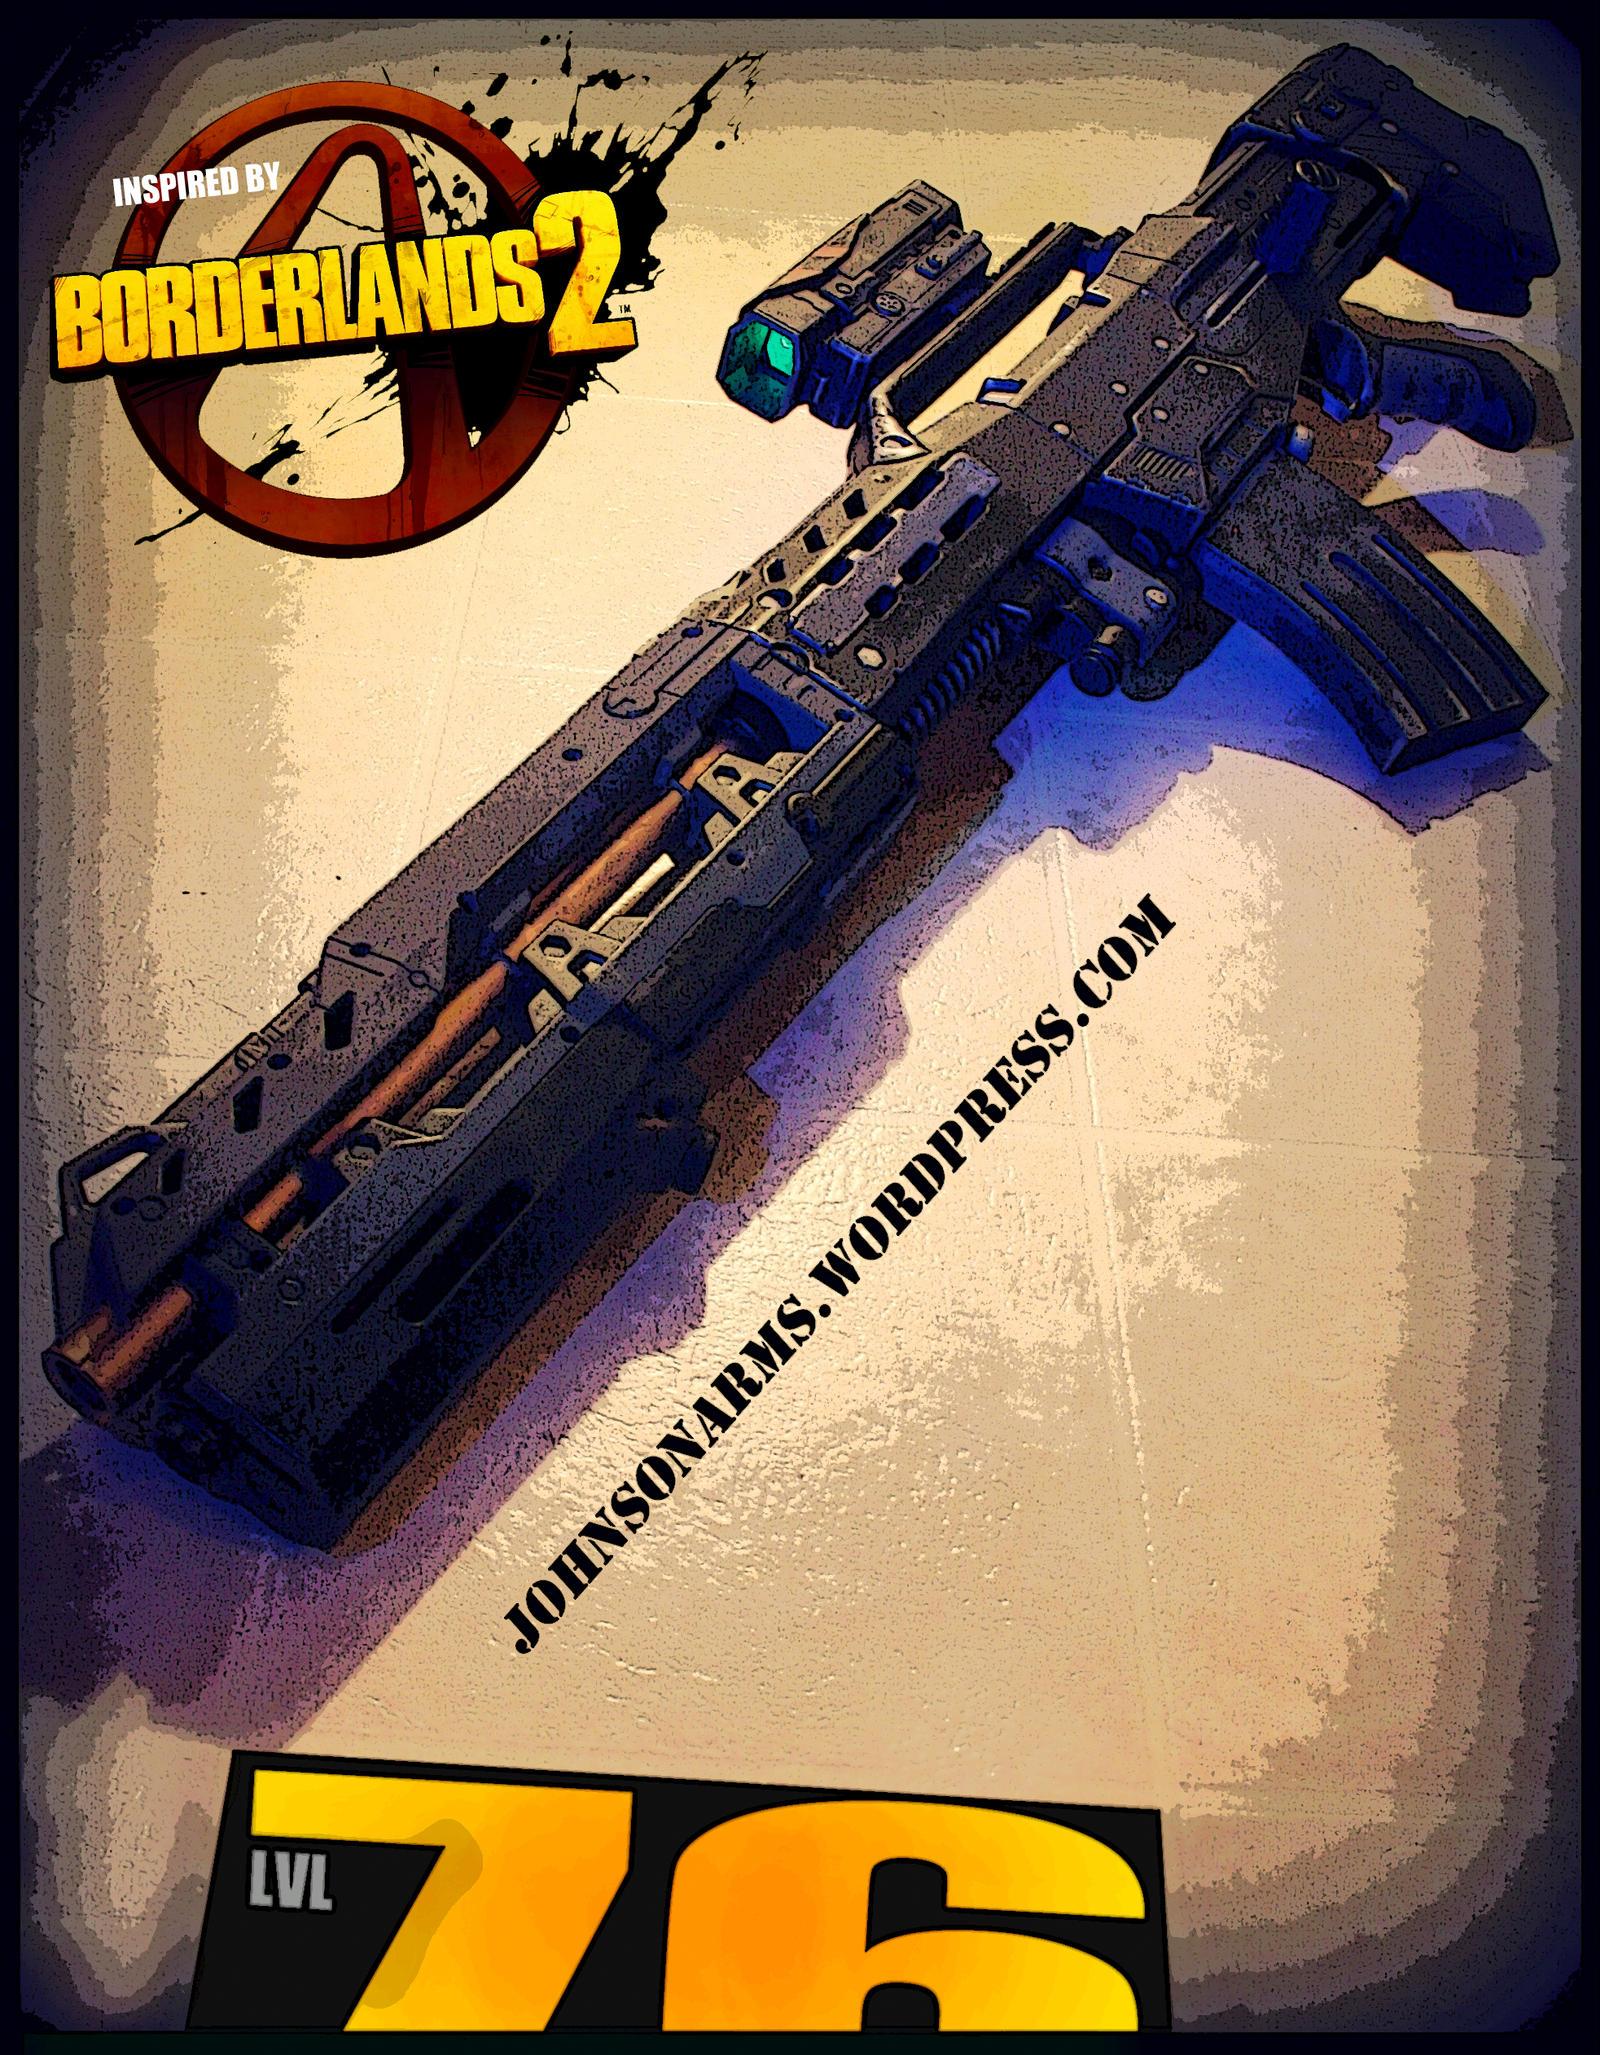 Borderlands 2 Themed Nerf Longshot by JohnsonArms